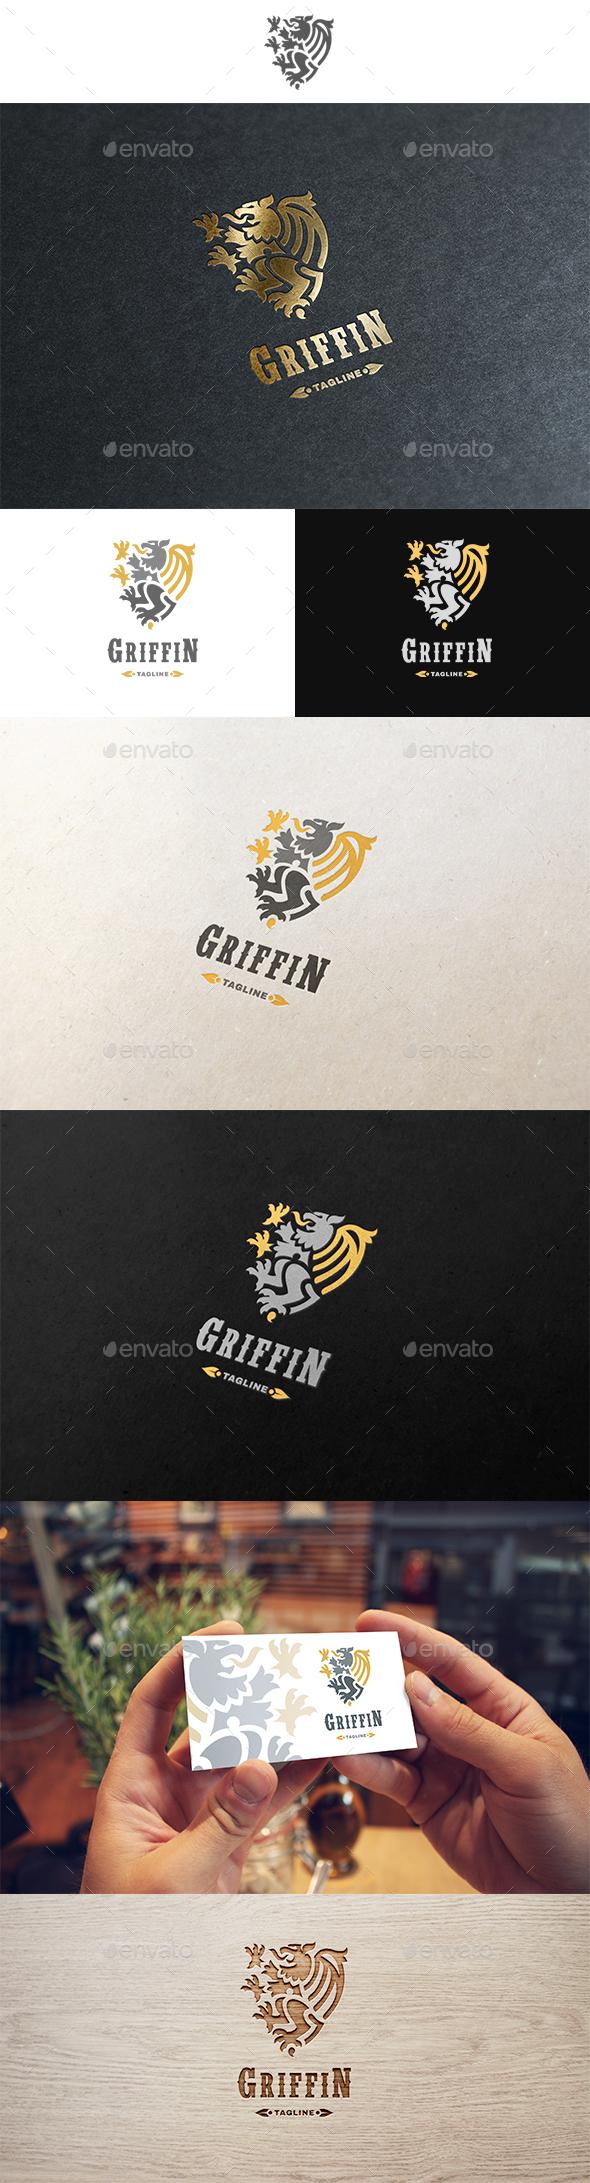 Griffin Logo - Crests Logo Templates